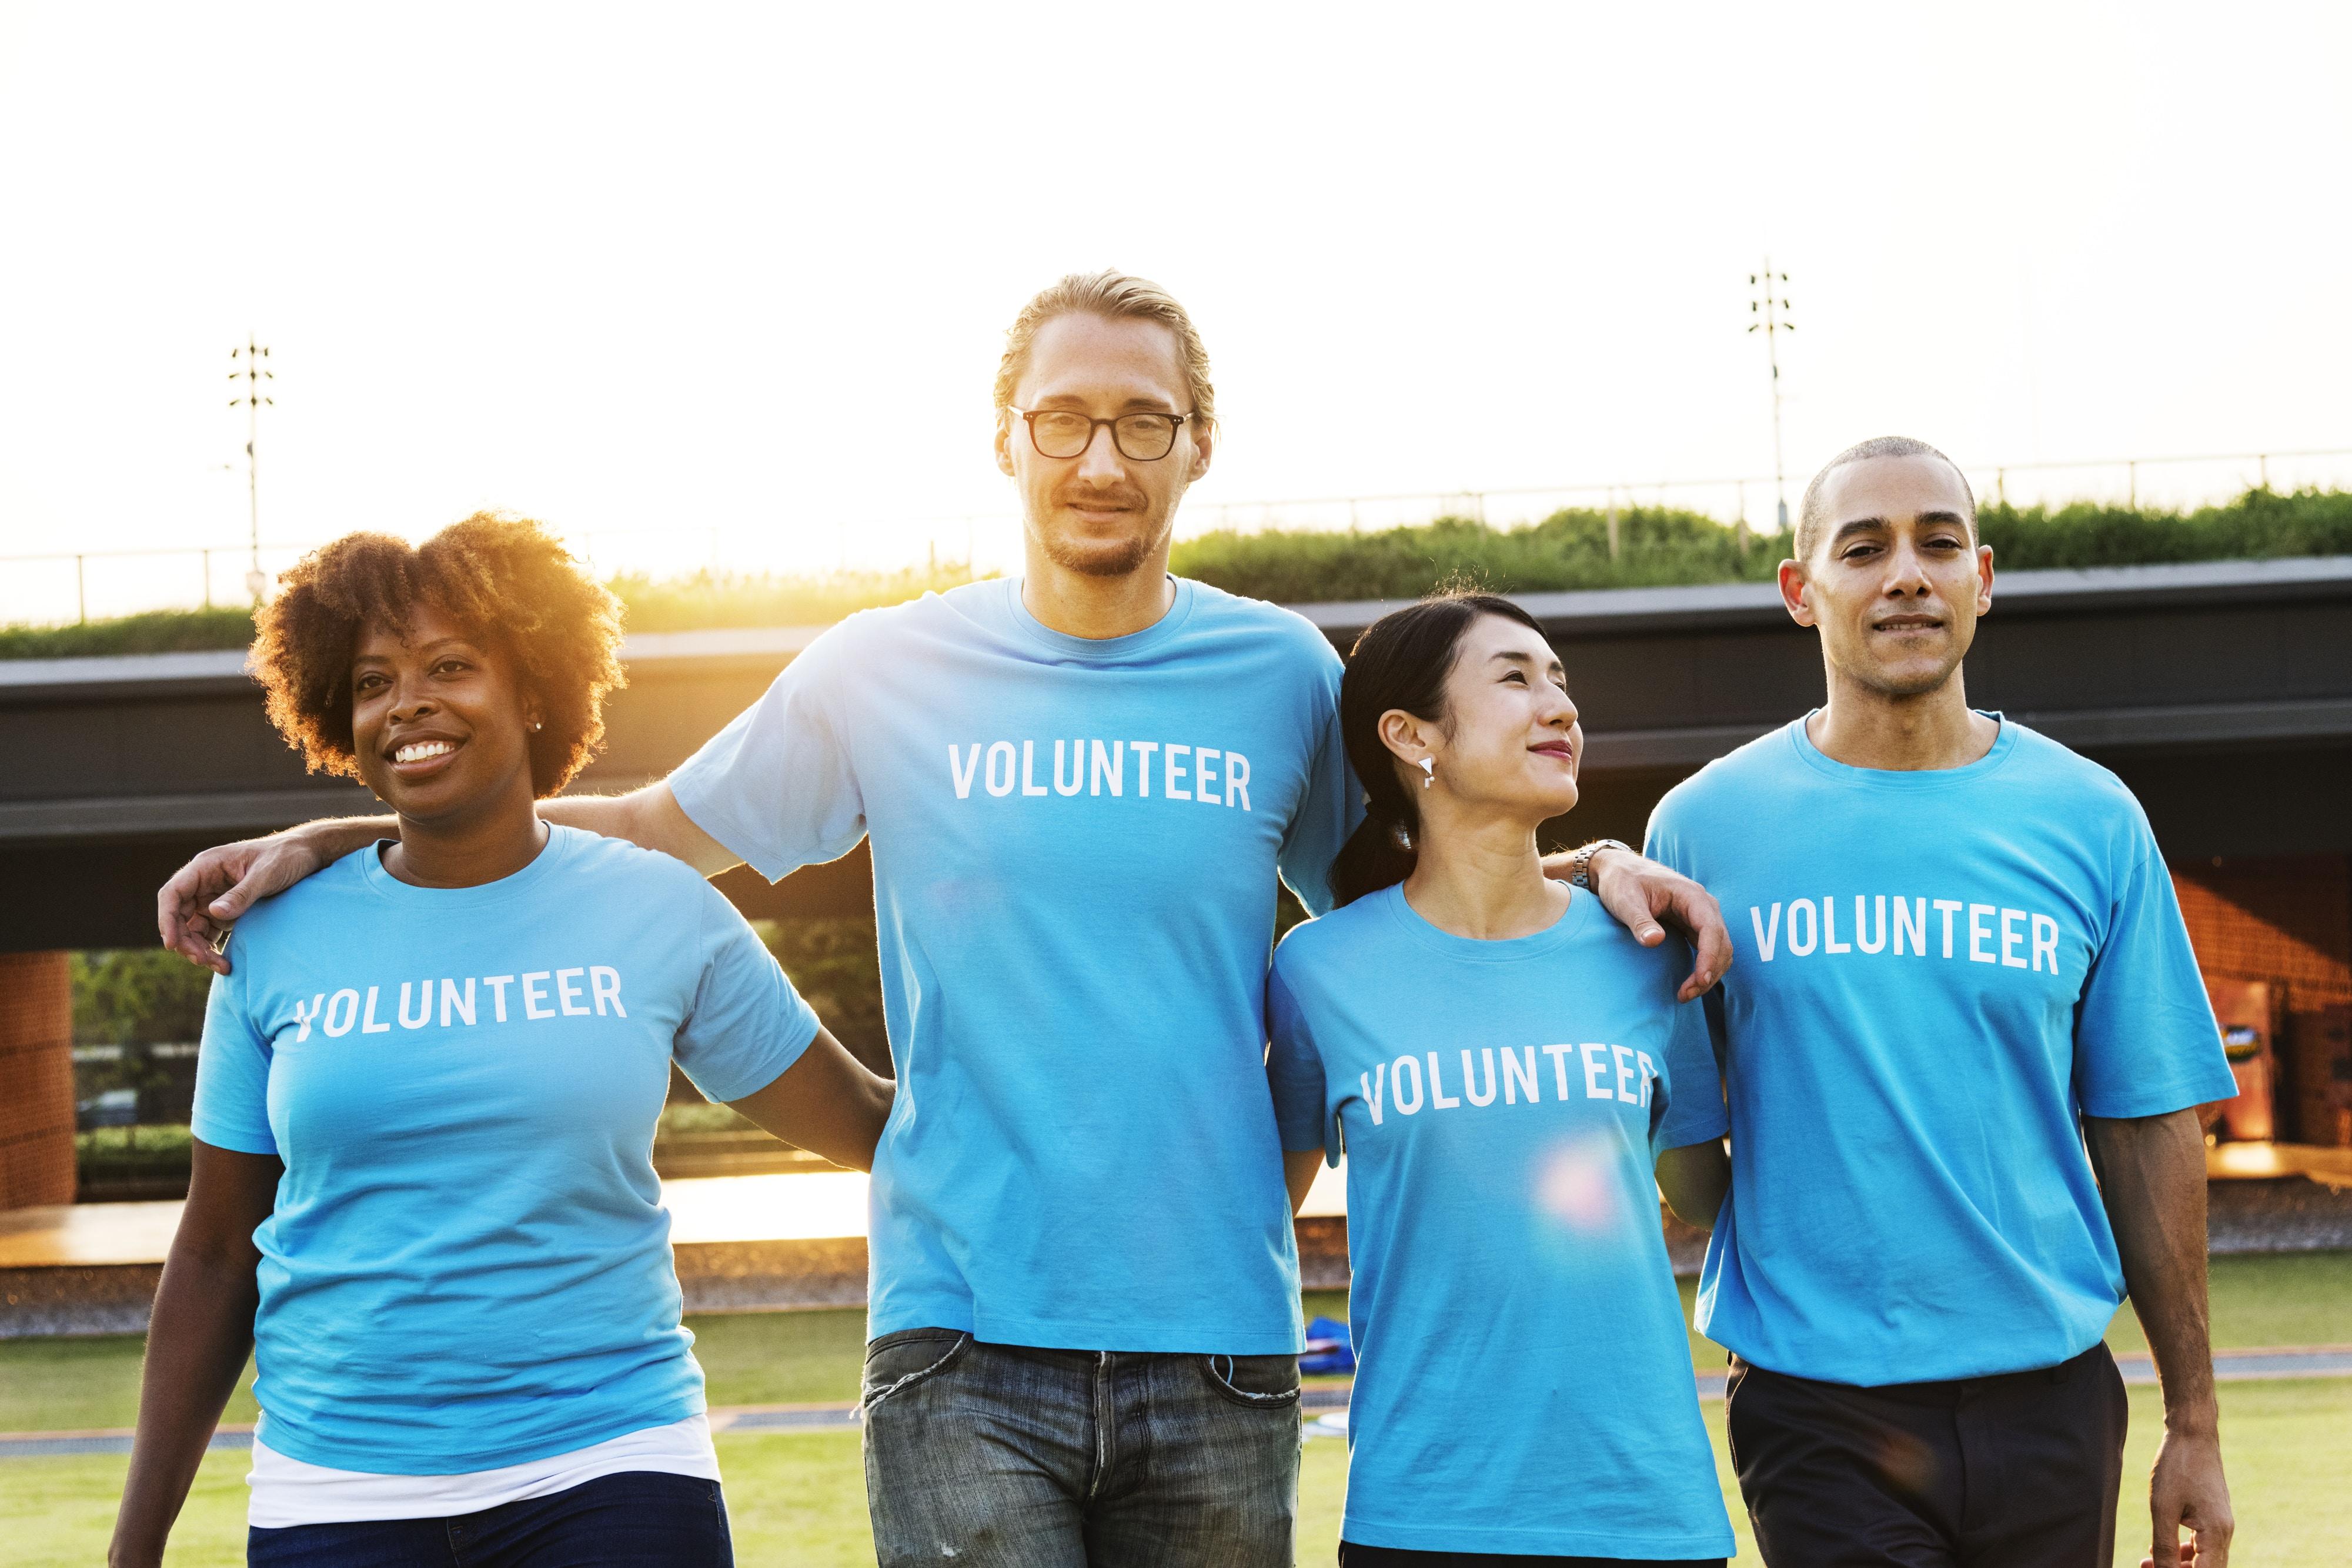 two men and women wearing blue volunteer-printed crew-neck t-shirts